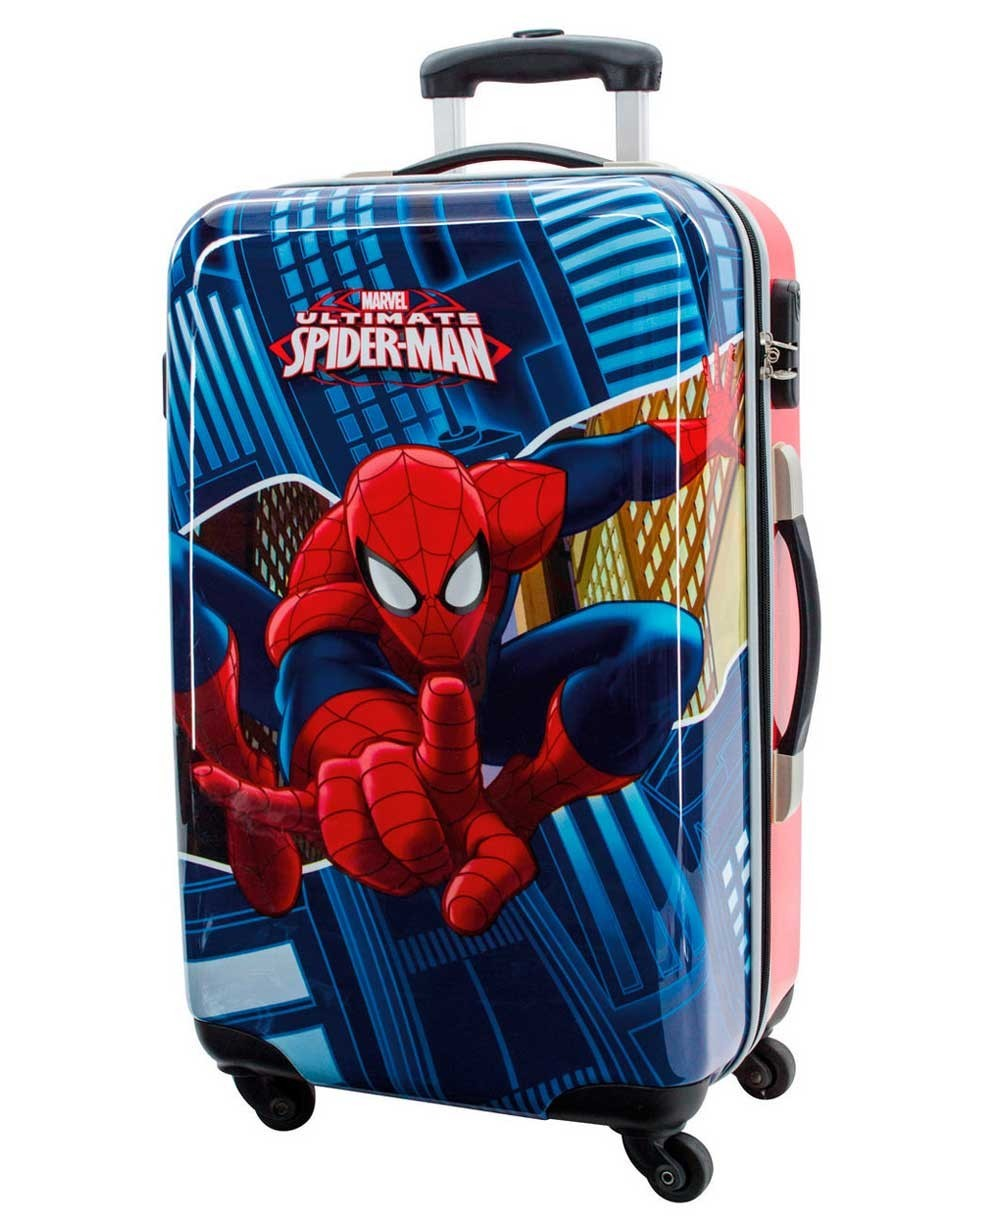 Marvel Spiderman Maleta mediana Azul (Foto )